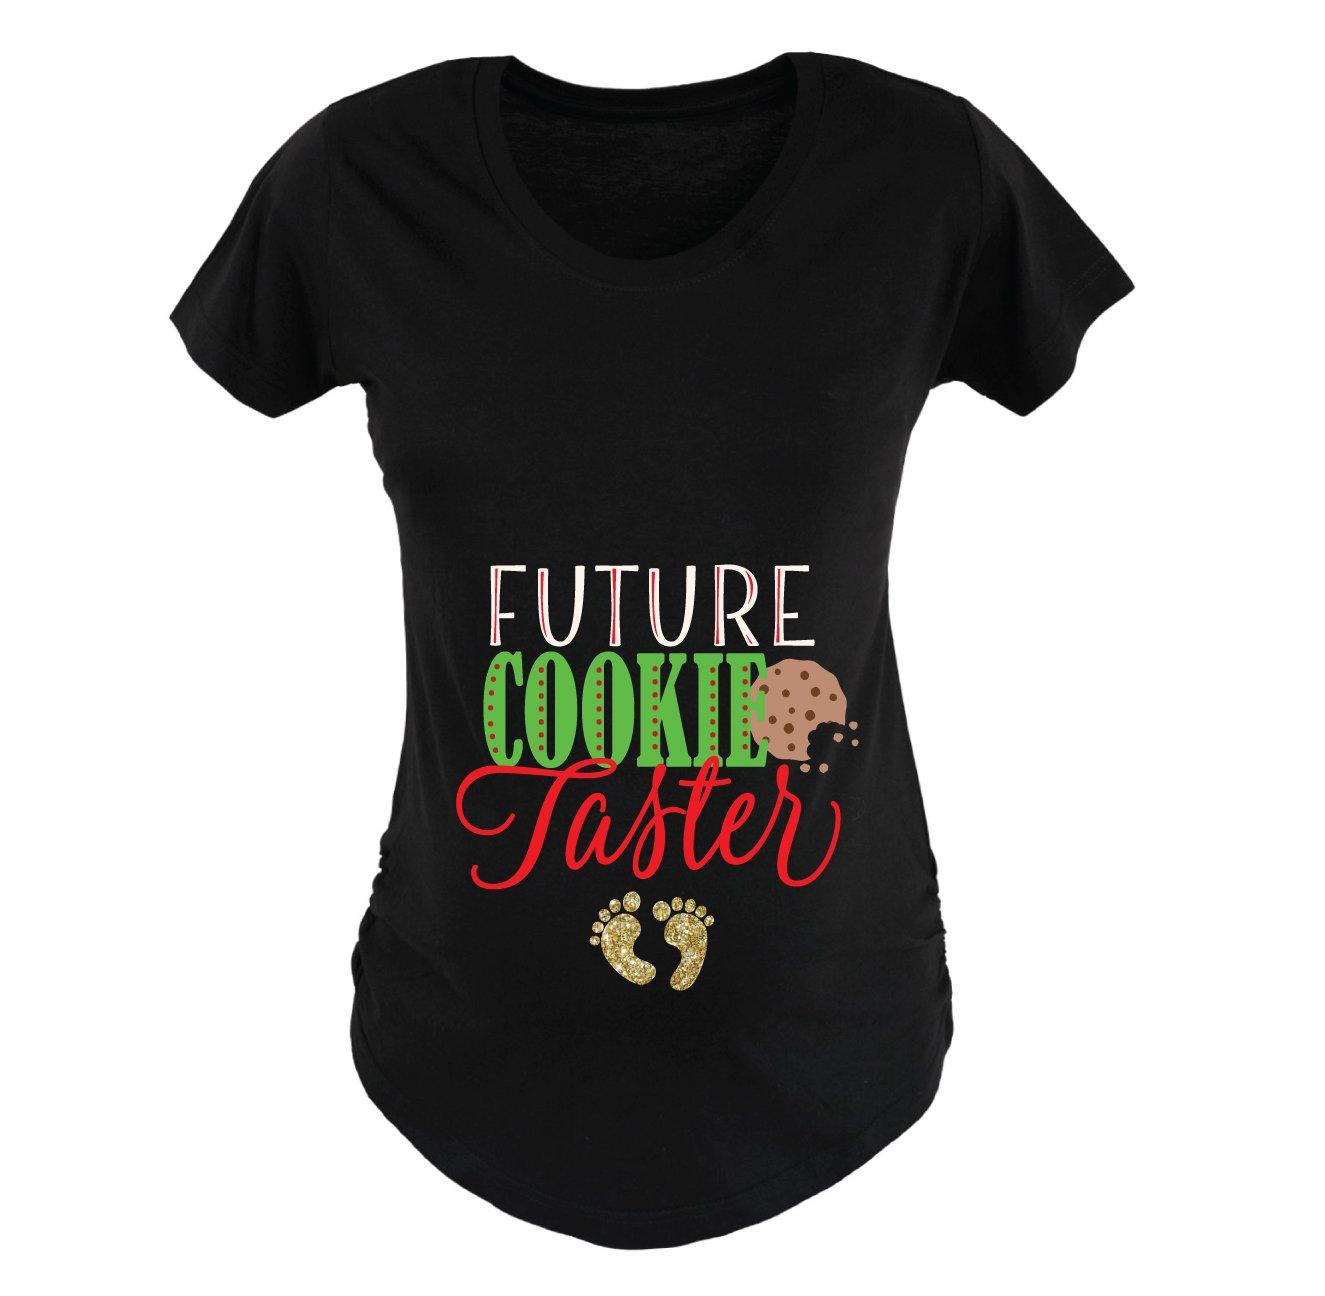 Maternity Christmas Outfit.Amazon Com Christmas Maternity Shirt Future Cooke Taster